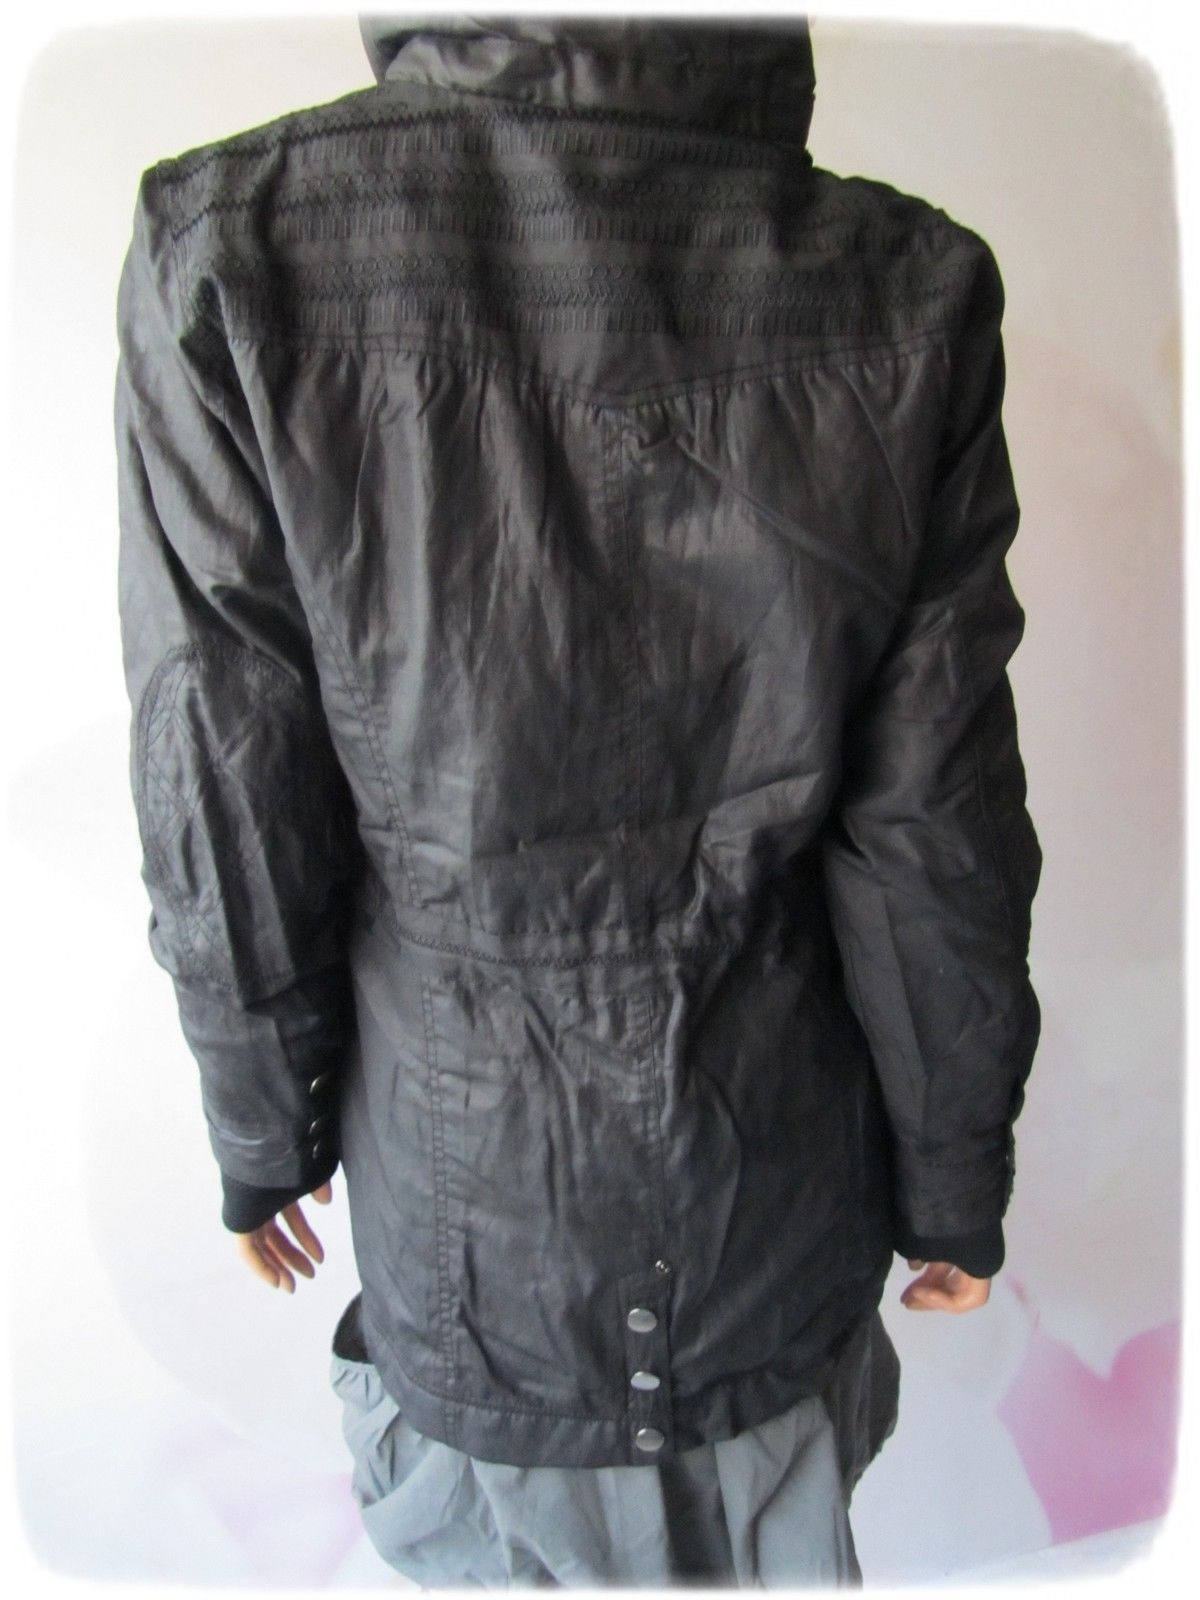 nü by Staff schöne Kapuzen-Jacke-, black, Gr. M, NEU!!! | eBay